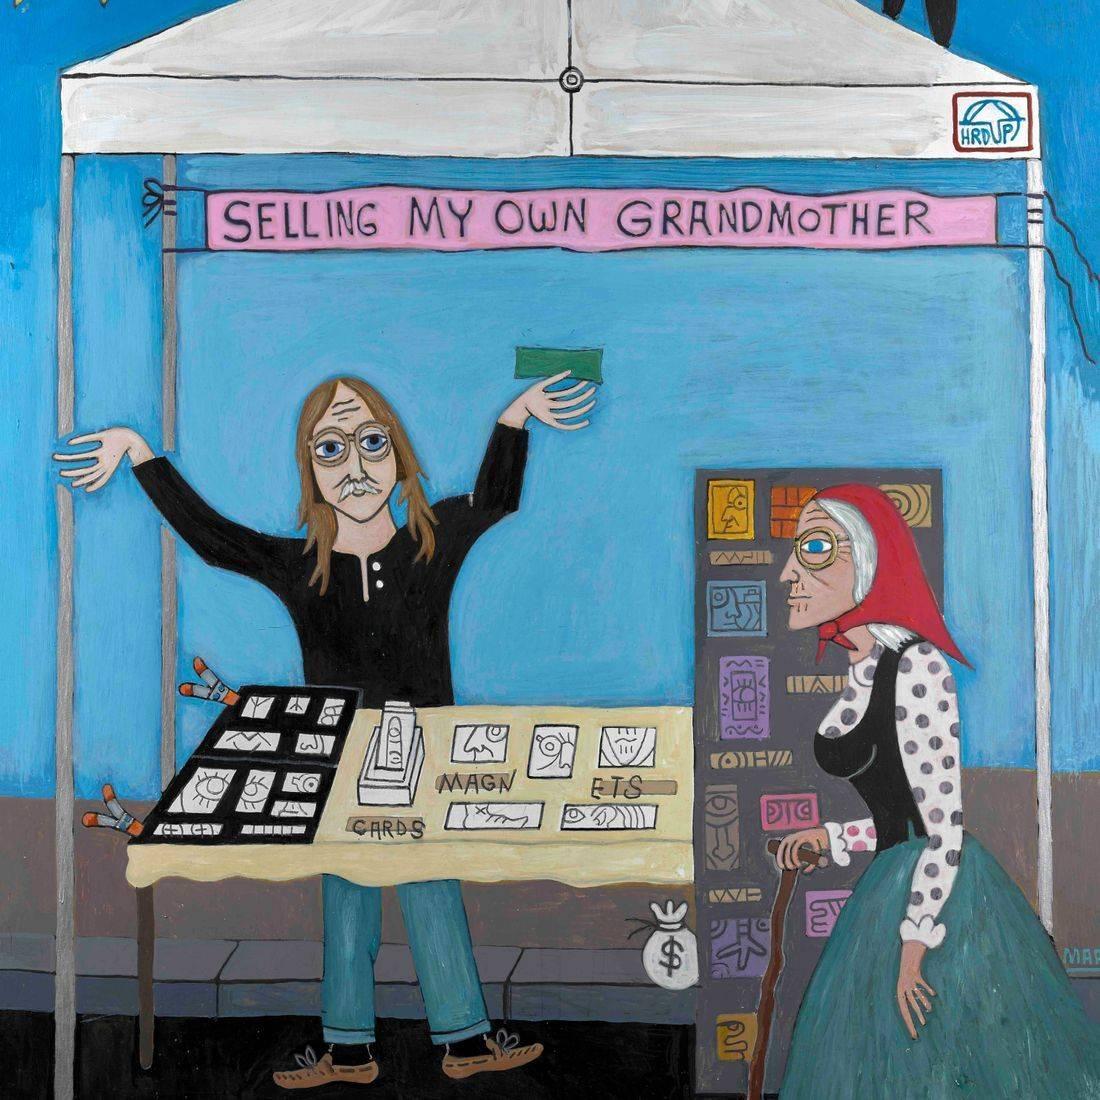 Michael Andryc,  Self Portrait, Artist, Art Festival, Art Booth, Grandmother, Michael Andryc Self-Portrait, Grandmother, Business